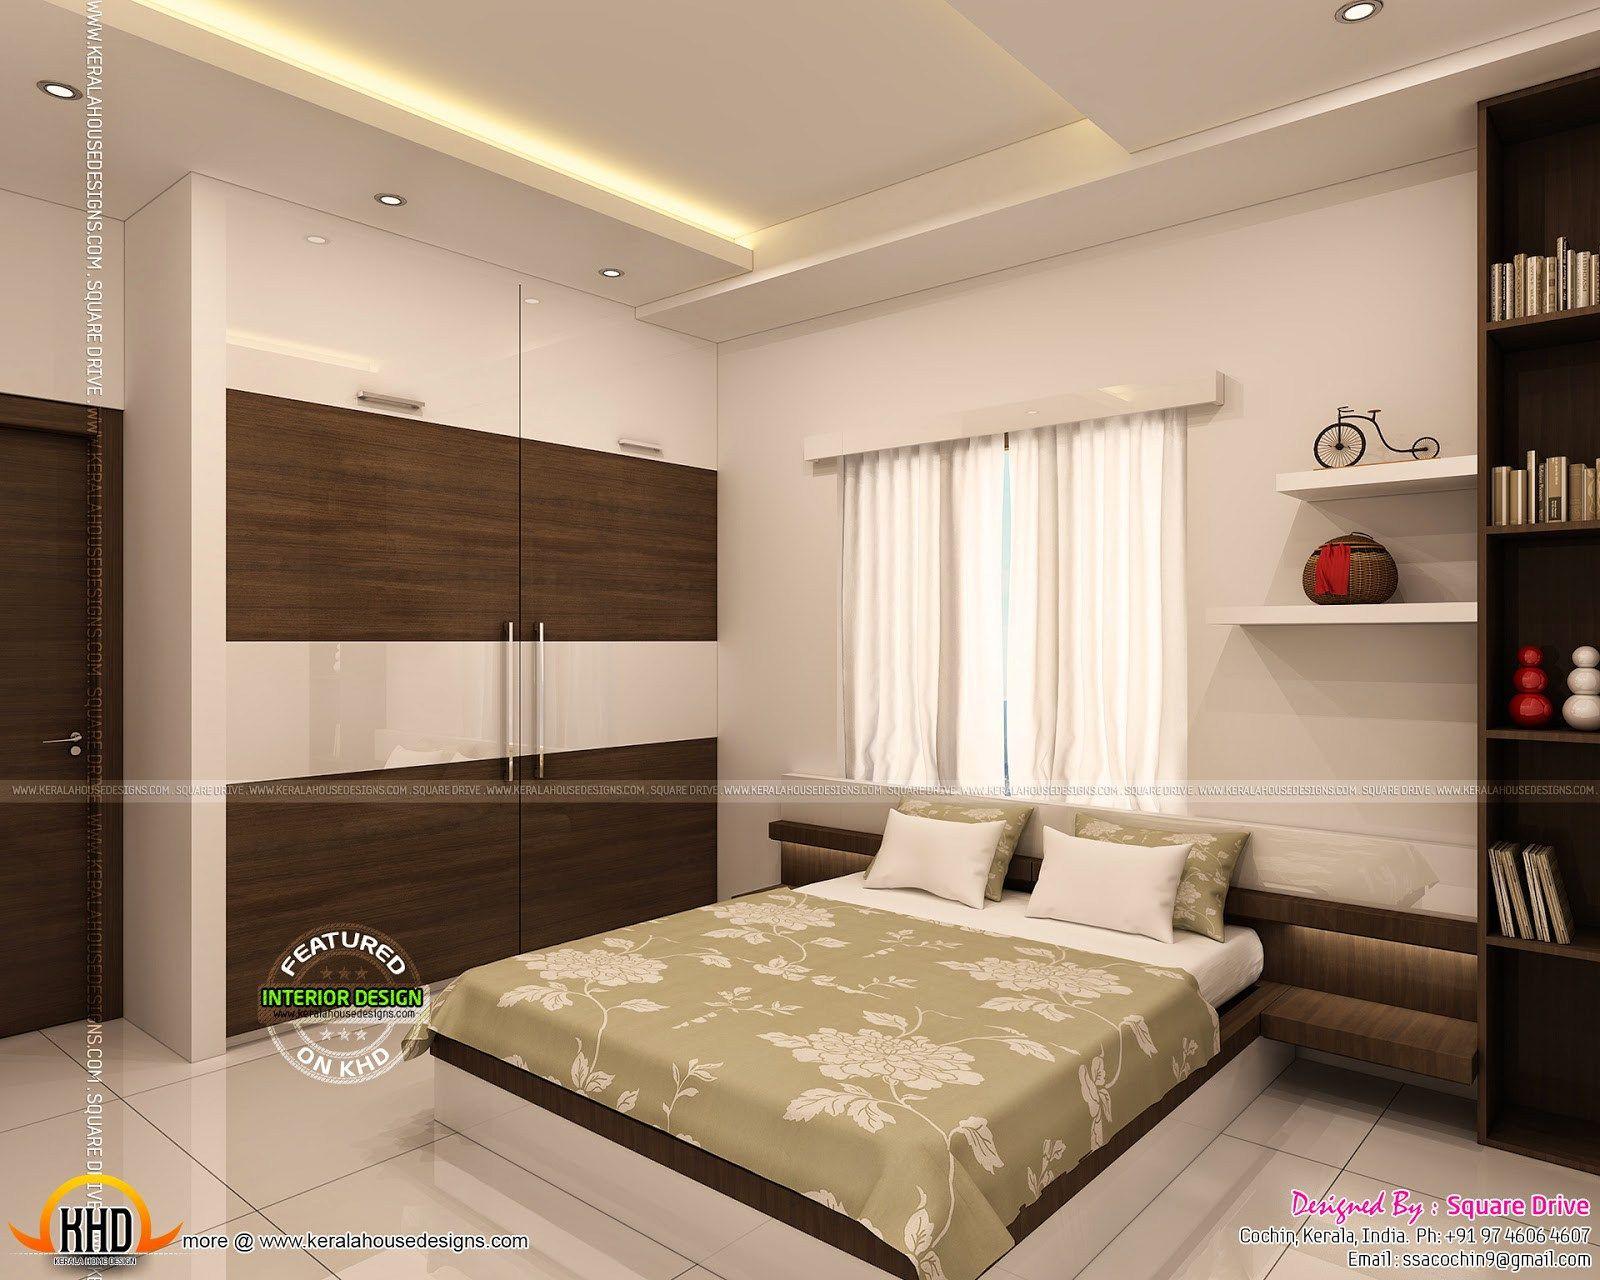 Trendy Bedroom Interior Designs Kerala Home Design Floor Plans